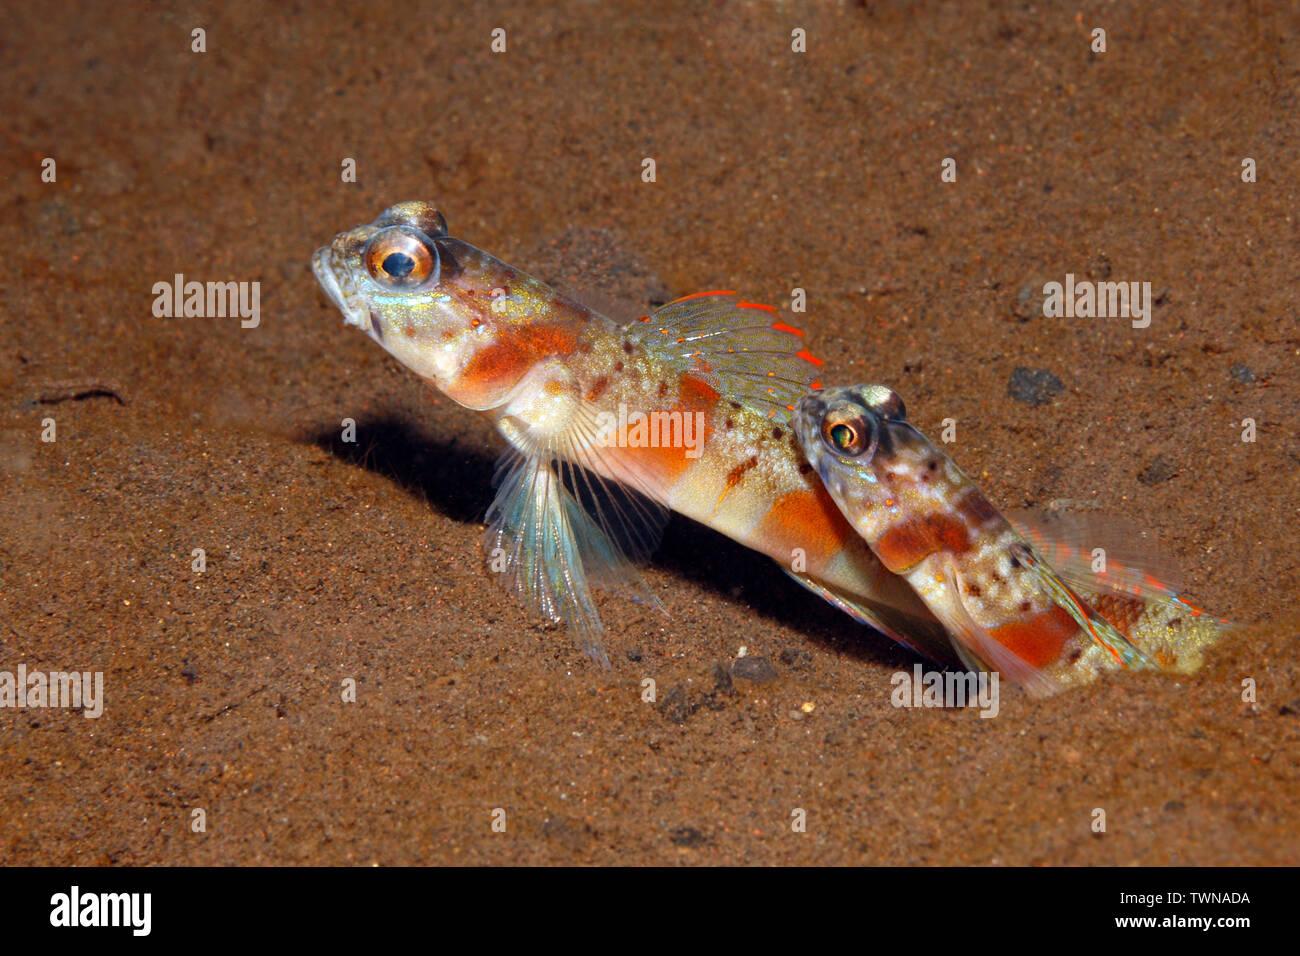 redmargin-shrimpgoby-amblyeleotris-rubrimarginata-pair-in-burrow-tulamben-bali-indonesia-bali-sea-indian-ocean-TWNADA.jpg